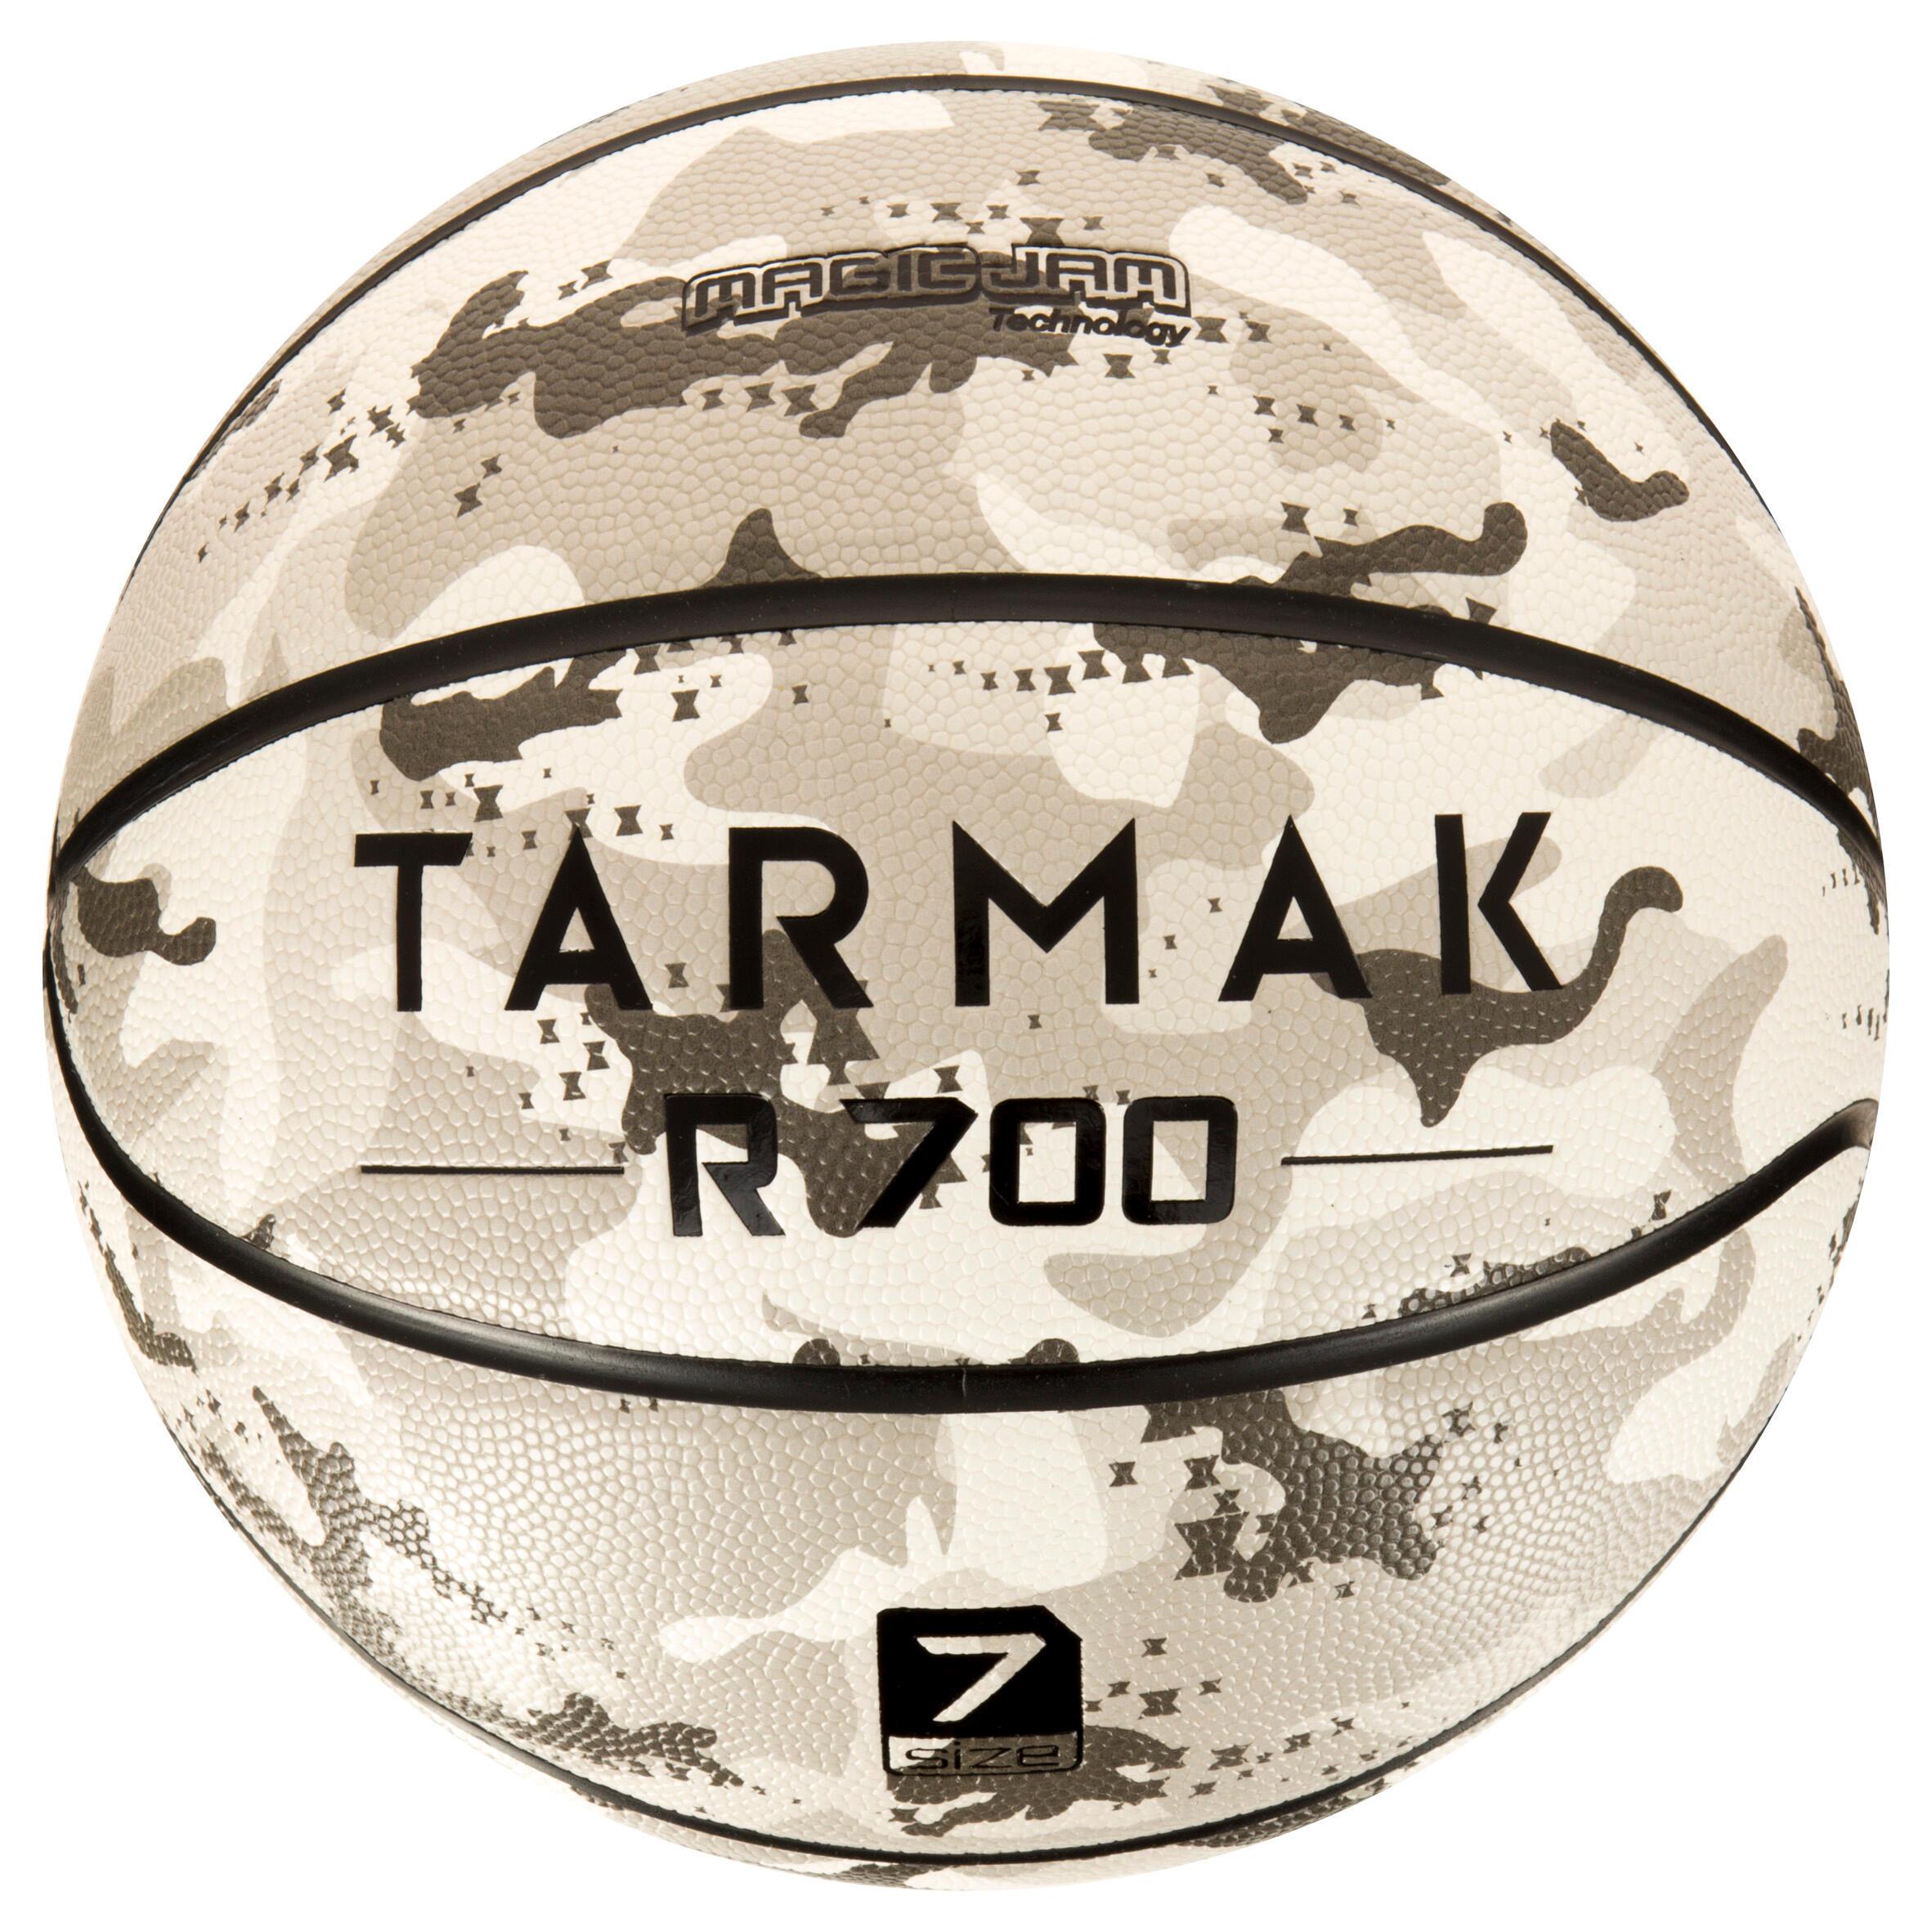 R700 Adult Size 7 Basketball - Grey Camo. Very good grip